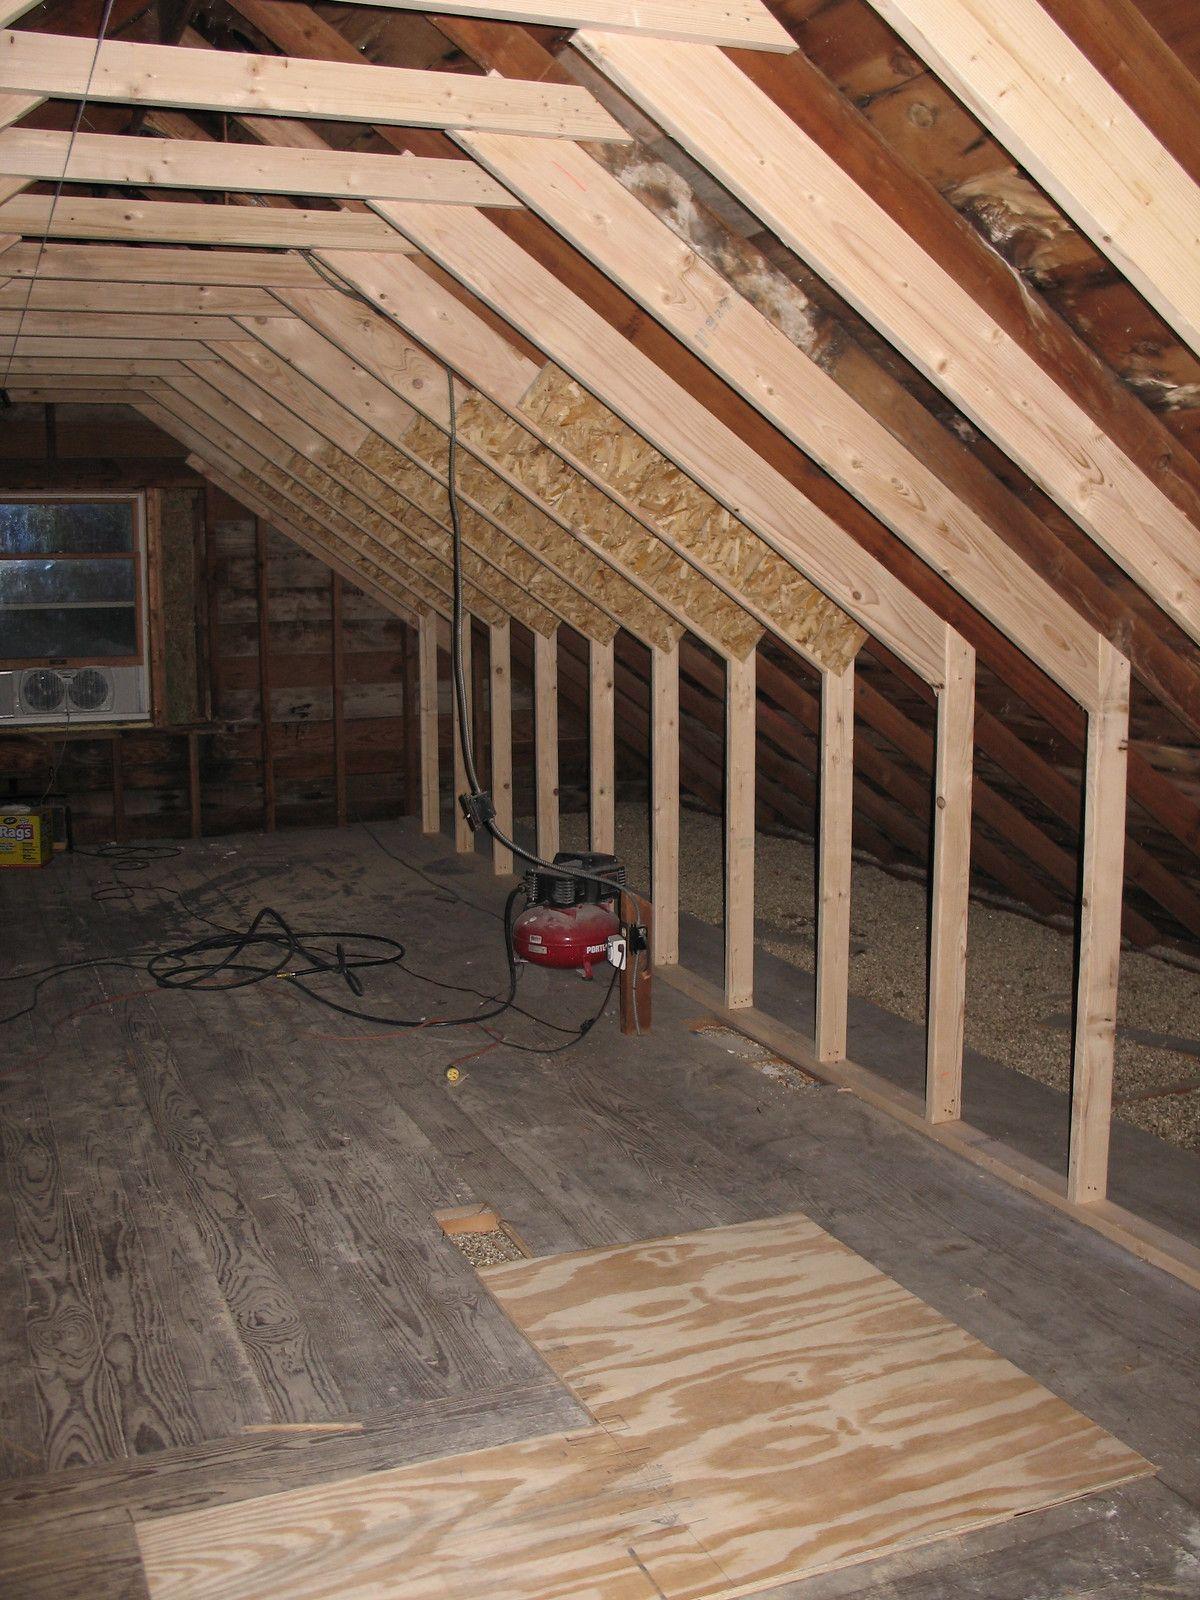 Chimney Removed In 2020 Attic Remodel Attic Renovation Attic Rooms